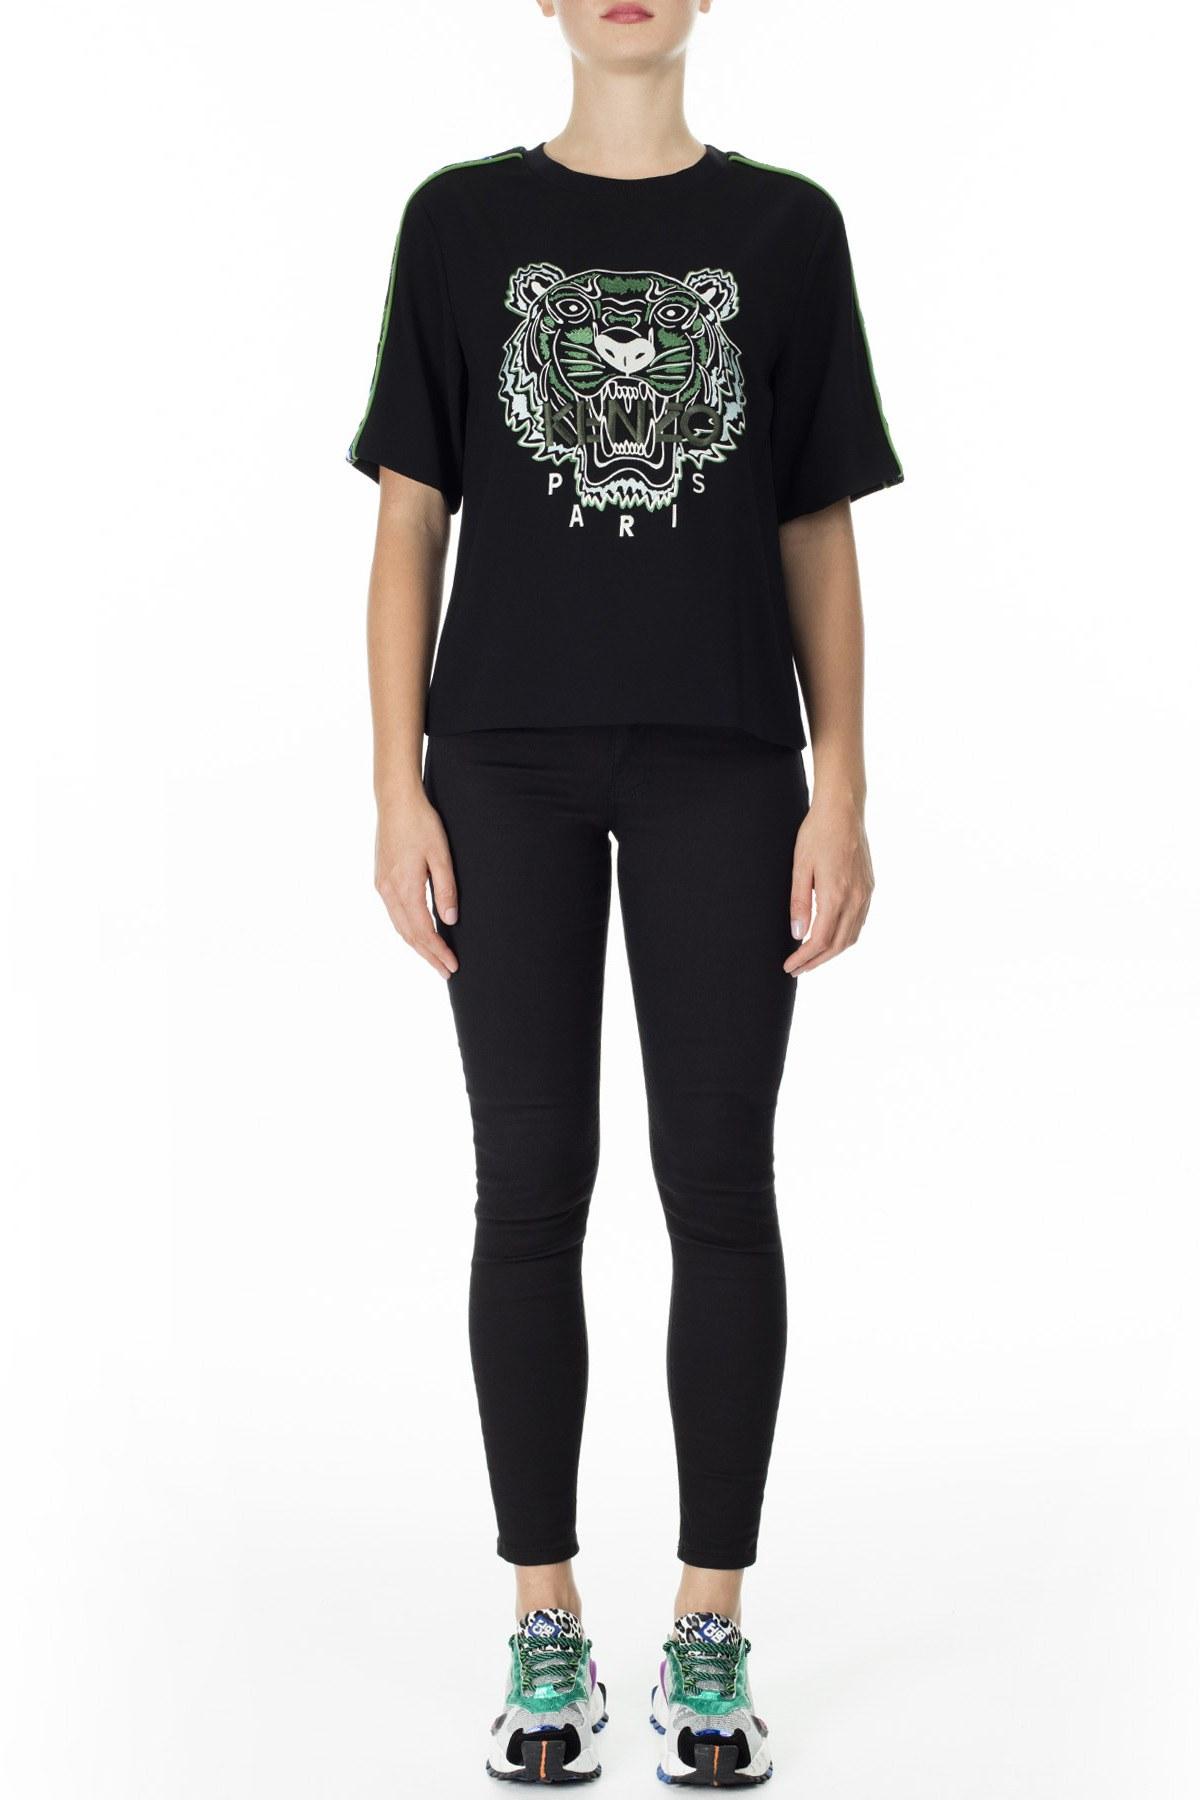 Kenzo Kadın T Shirt FA5 2TO176 5AC 59 SİYAH